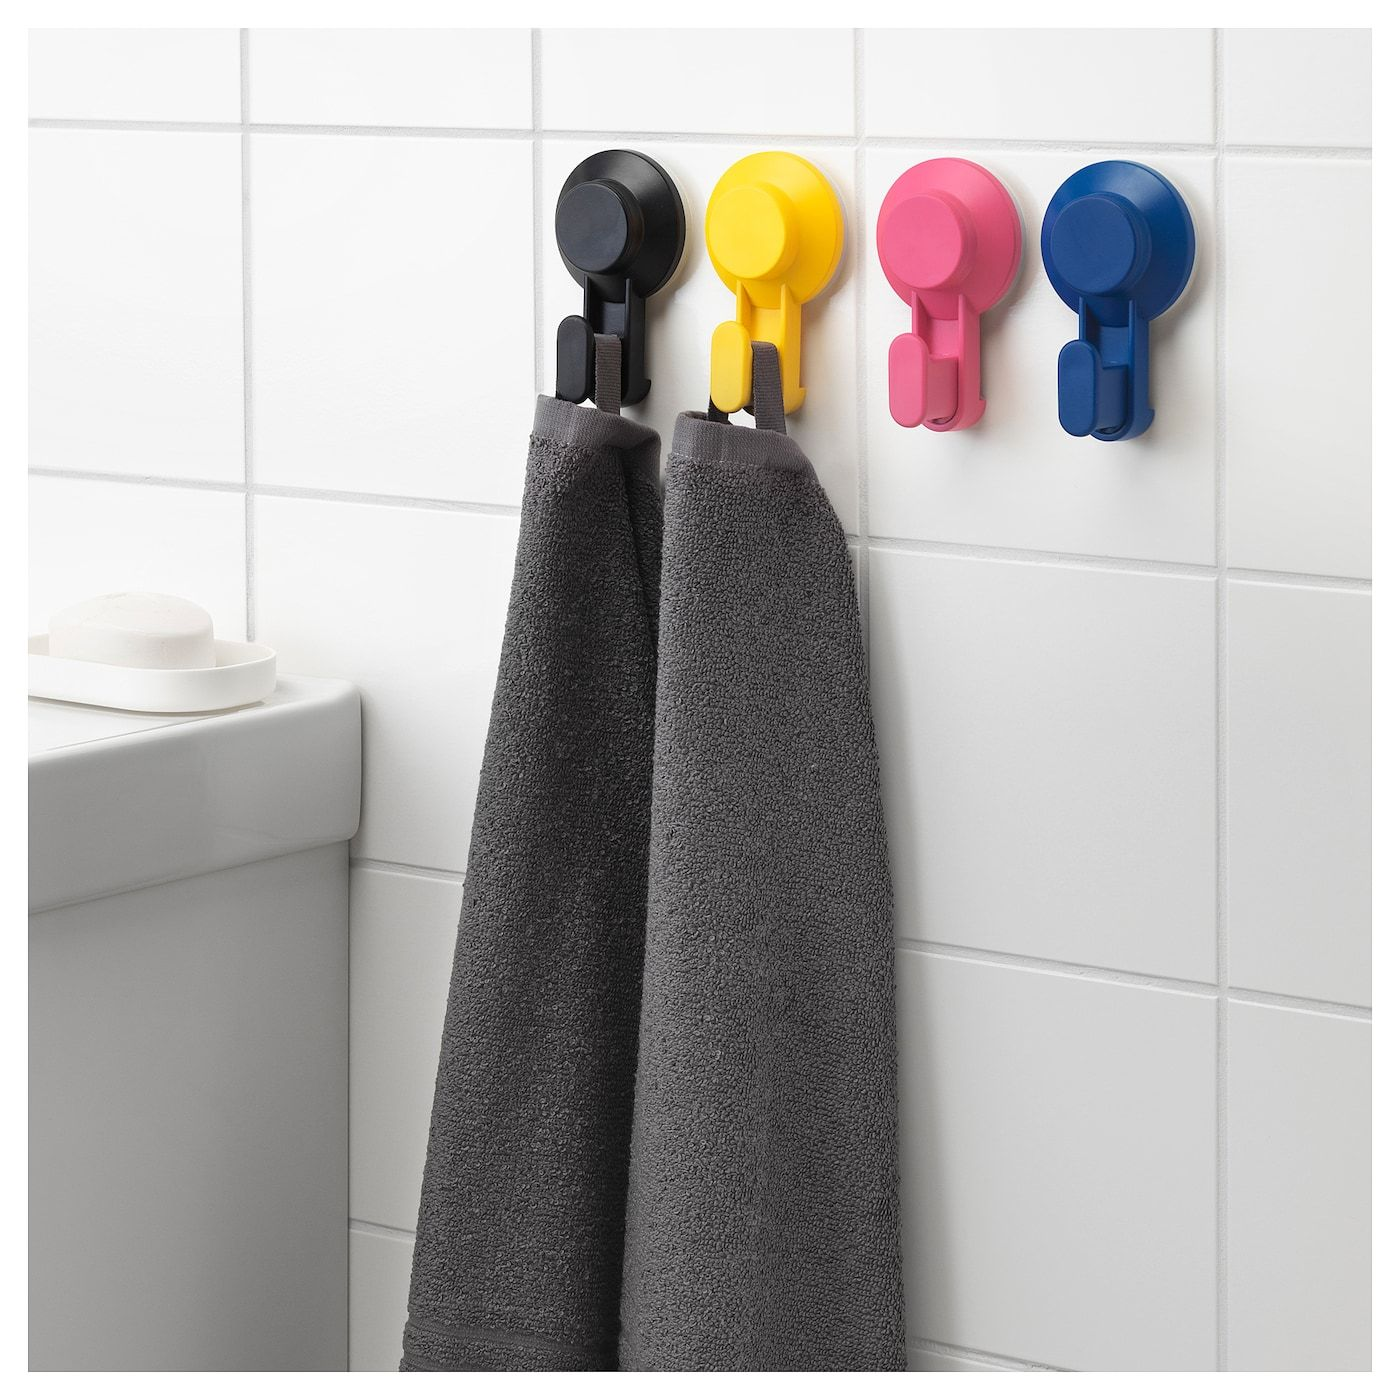 Ikea Tisken Haken Mit Saugnapf Ikea Farben Spiegelglas